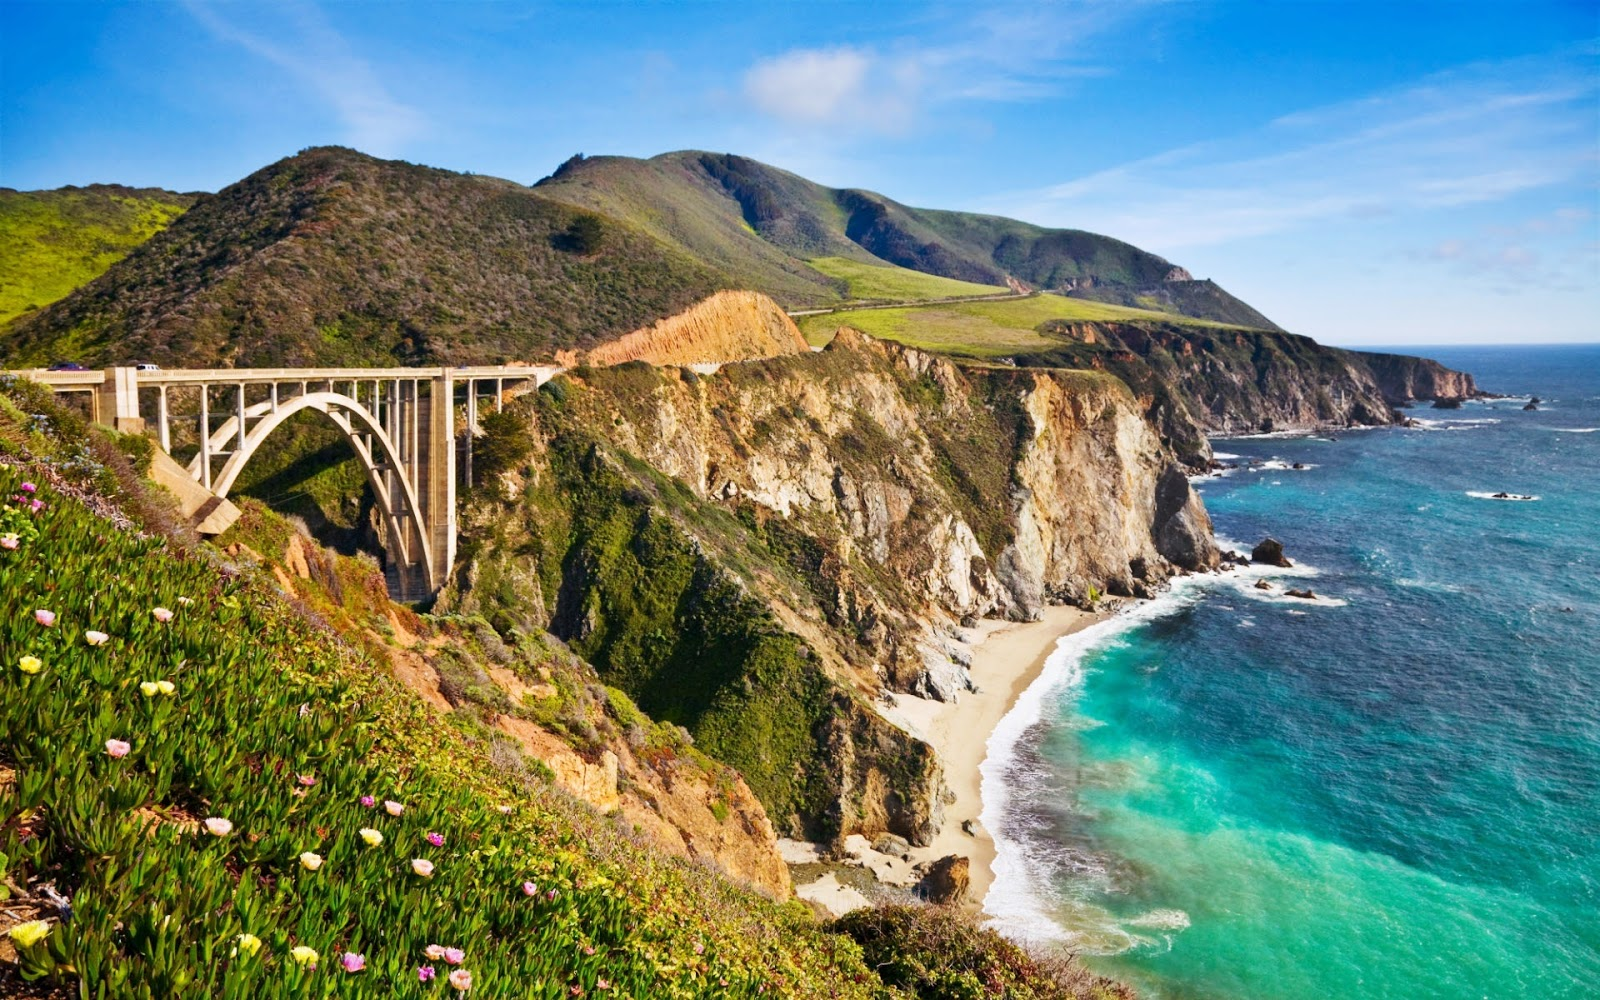 http://3.bp.blogspot.com/-vSpthtYkB-A/UHvJfjaDWTI/AAAAAAAAFXU/lgC9oZytspk/s1600/bixby_bridge_in_big_sur_california-1200.jpg